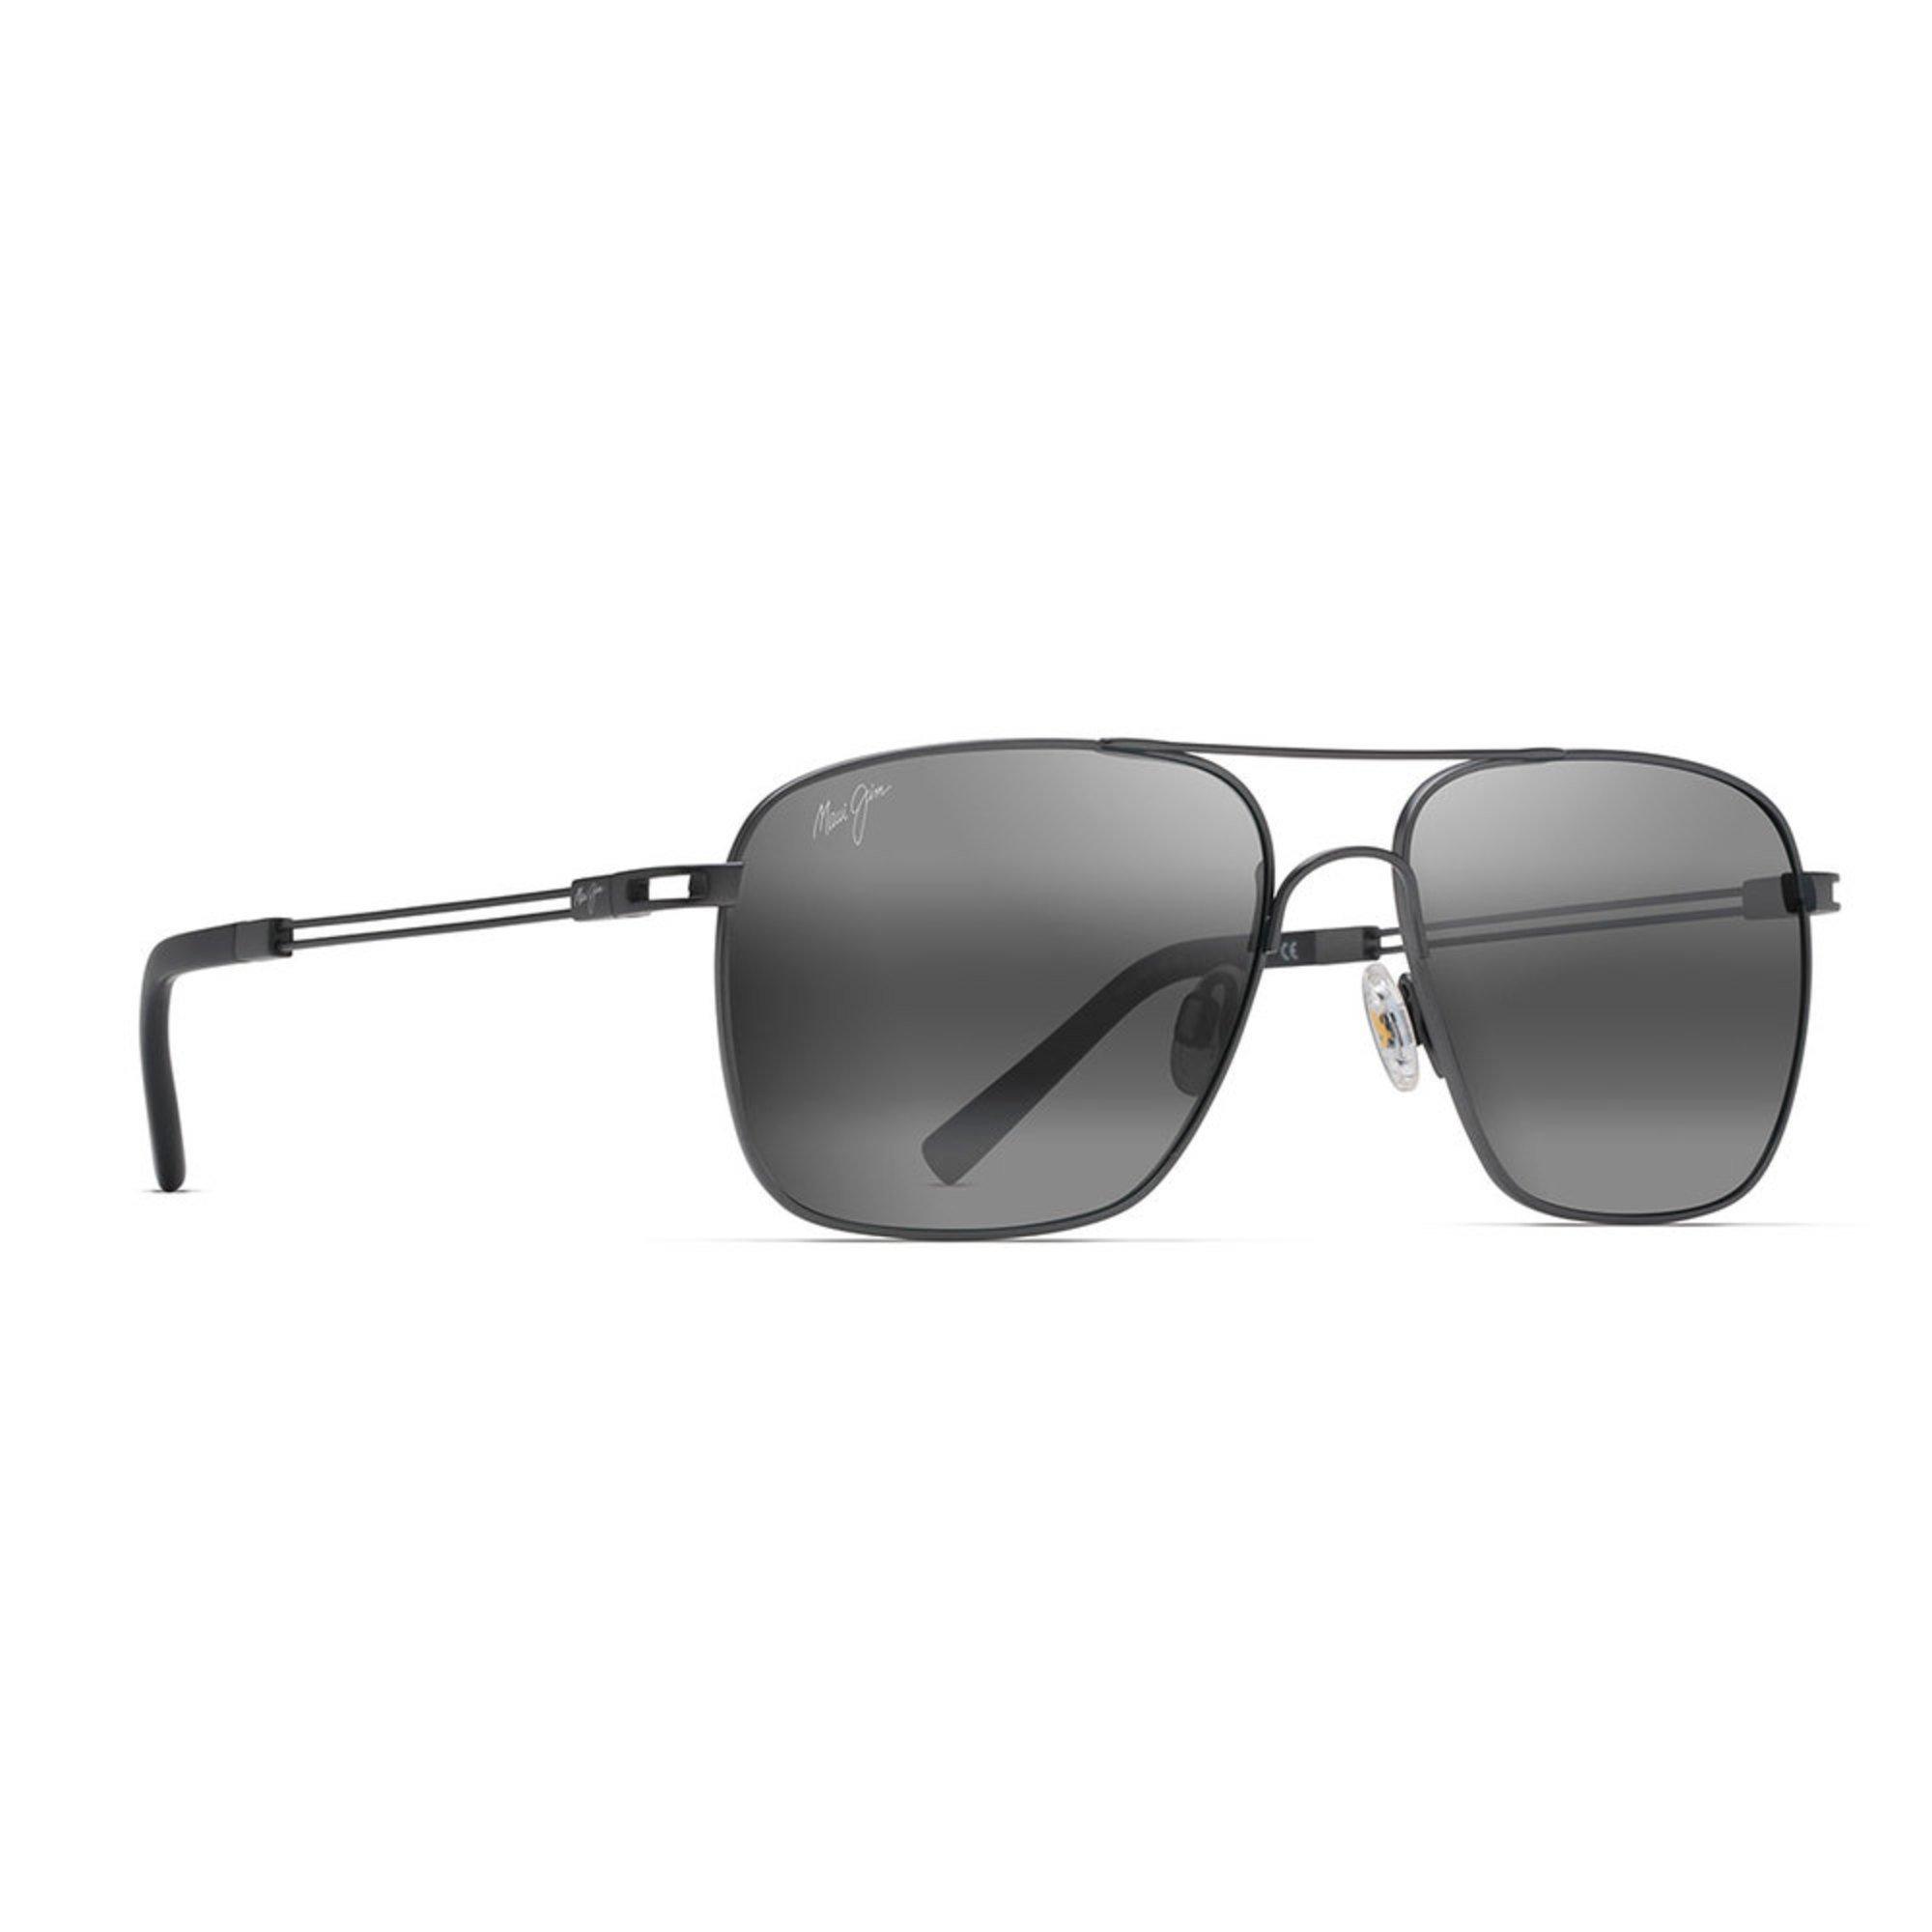 17052c16dd Maui Jim Unisex Haleiwa Gunmetal Sunglasses 56mm | Women's ...